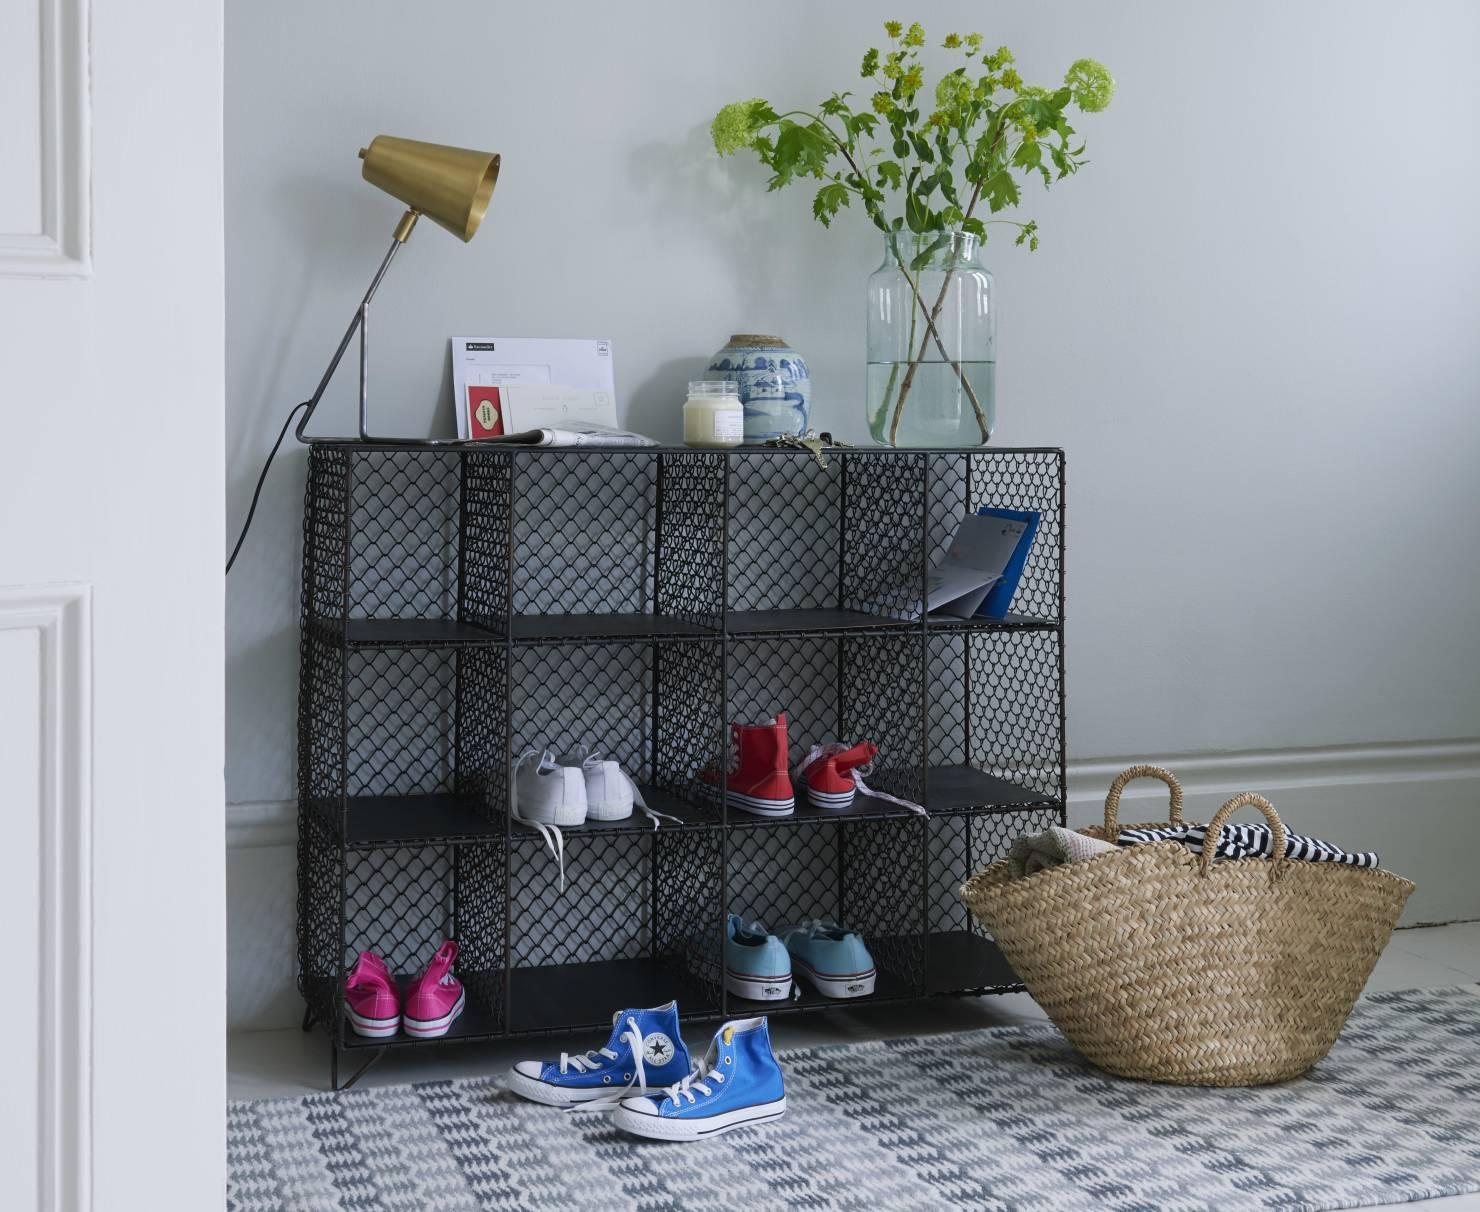 организация хранения обуви